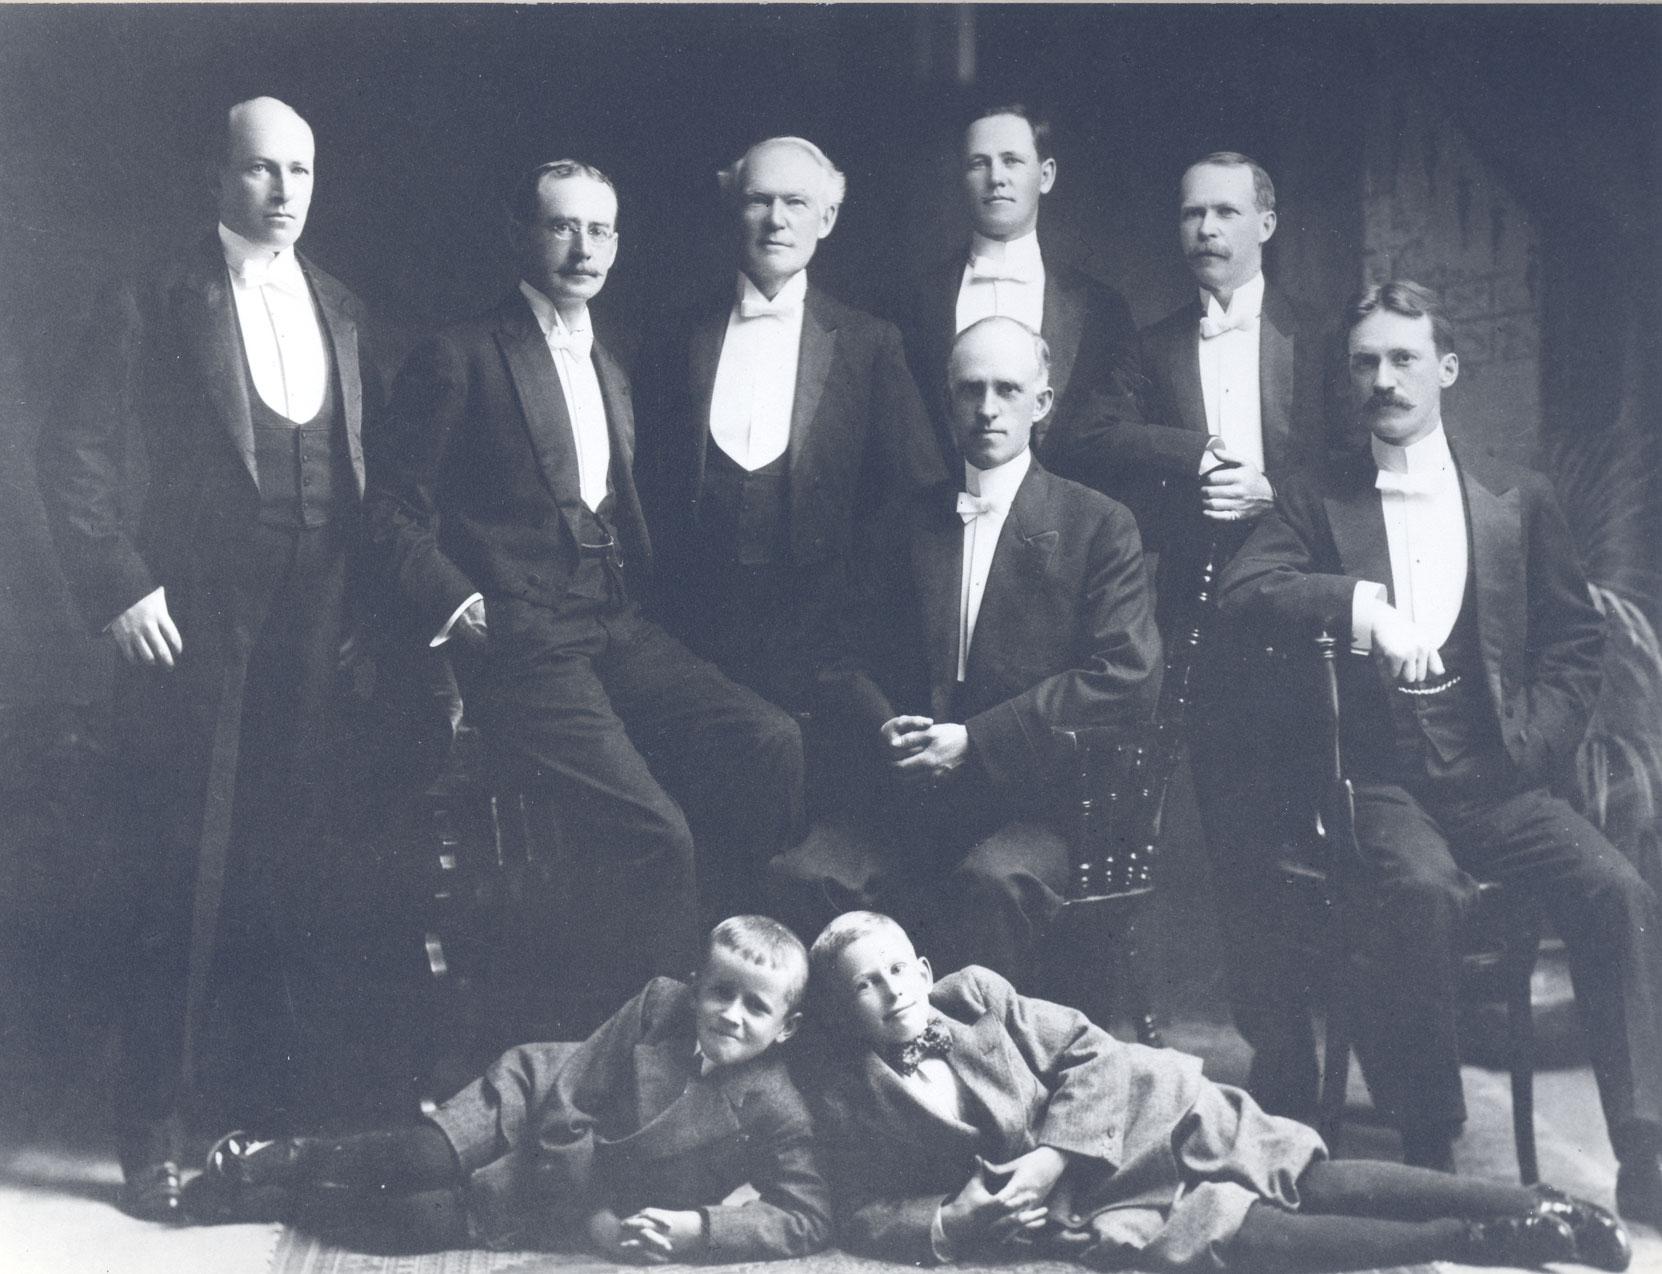 KIlbourn family portrait, 1911 (courtesy of William Mainguy - mainguy.ca)